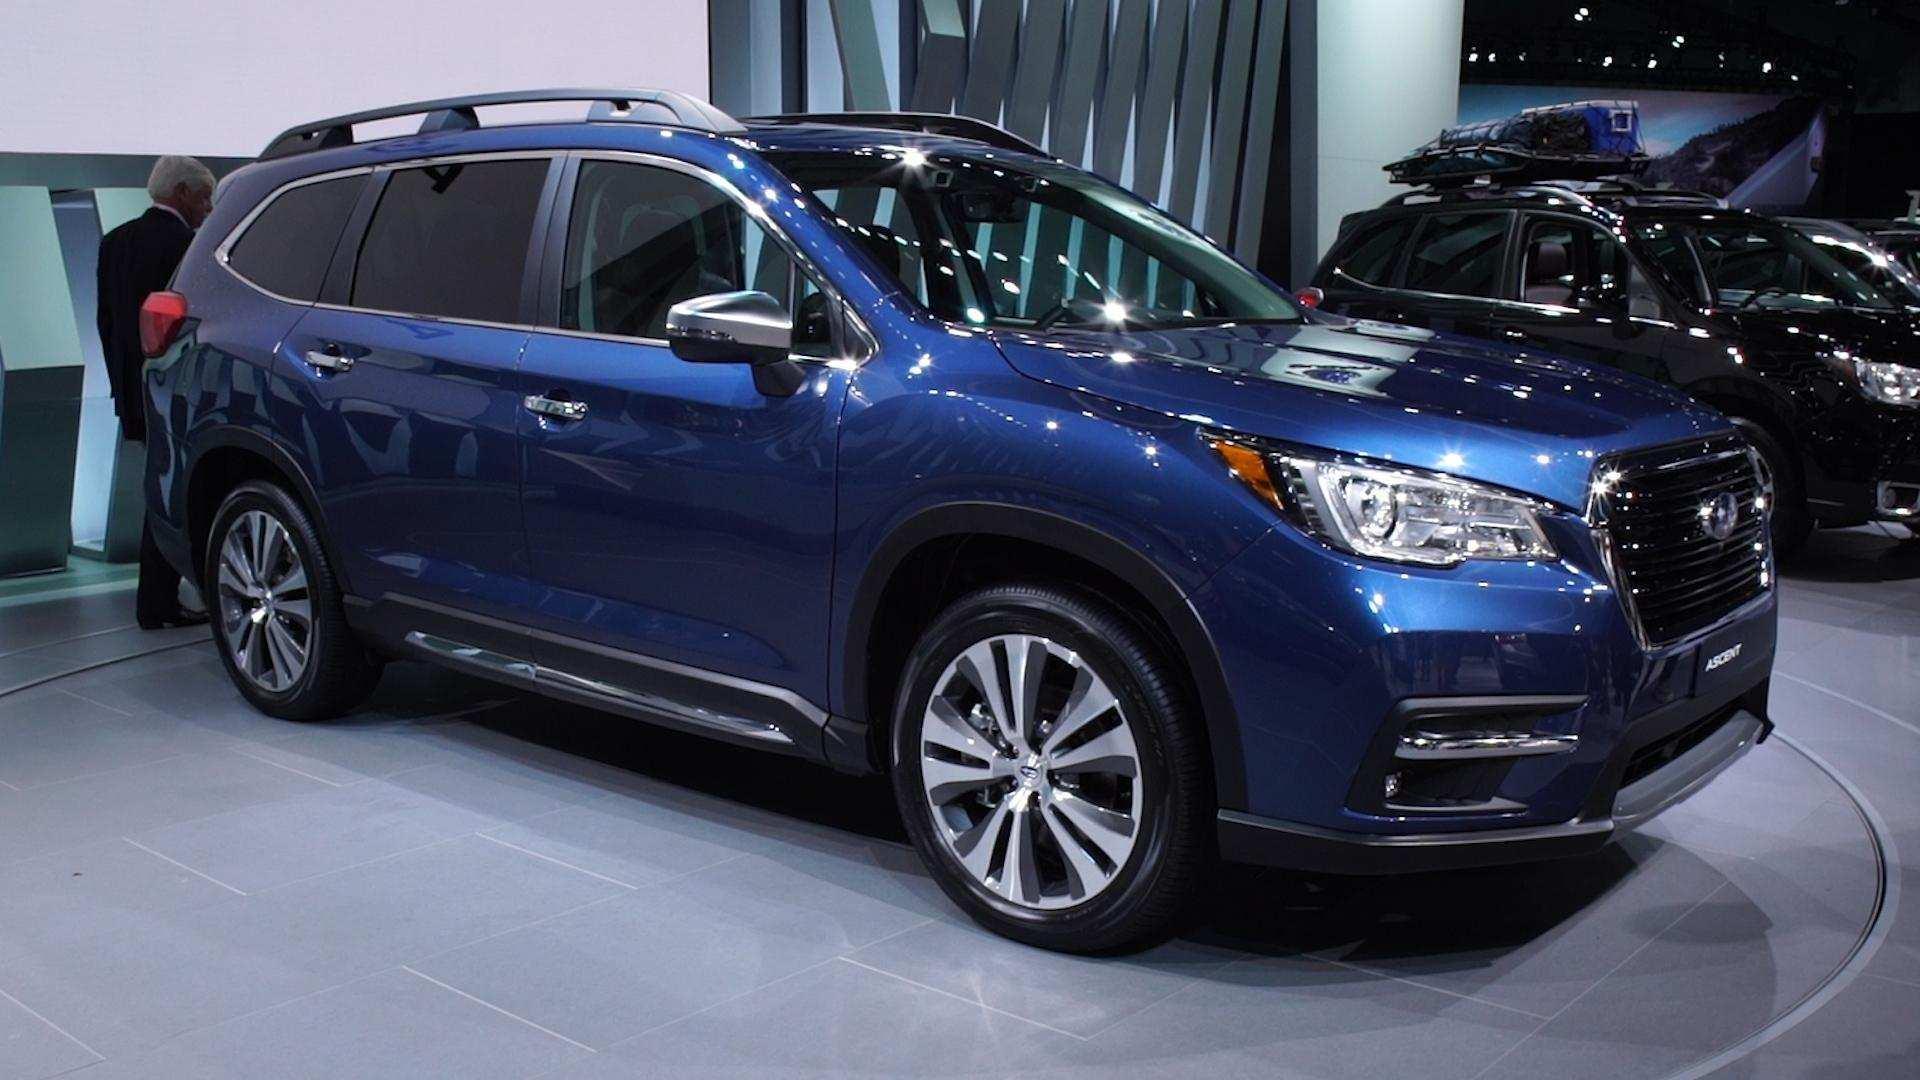 97 New 2019 Subaru Ascent News Speed Test with 2019 Subaru Ascent News